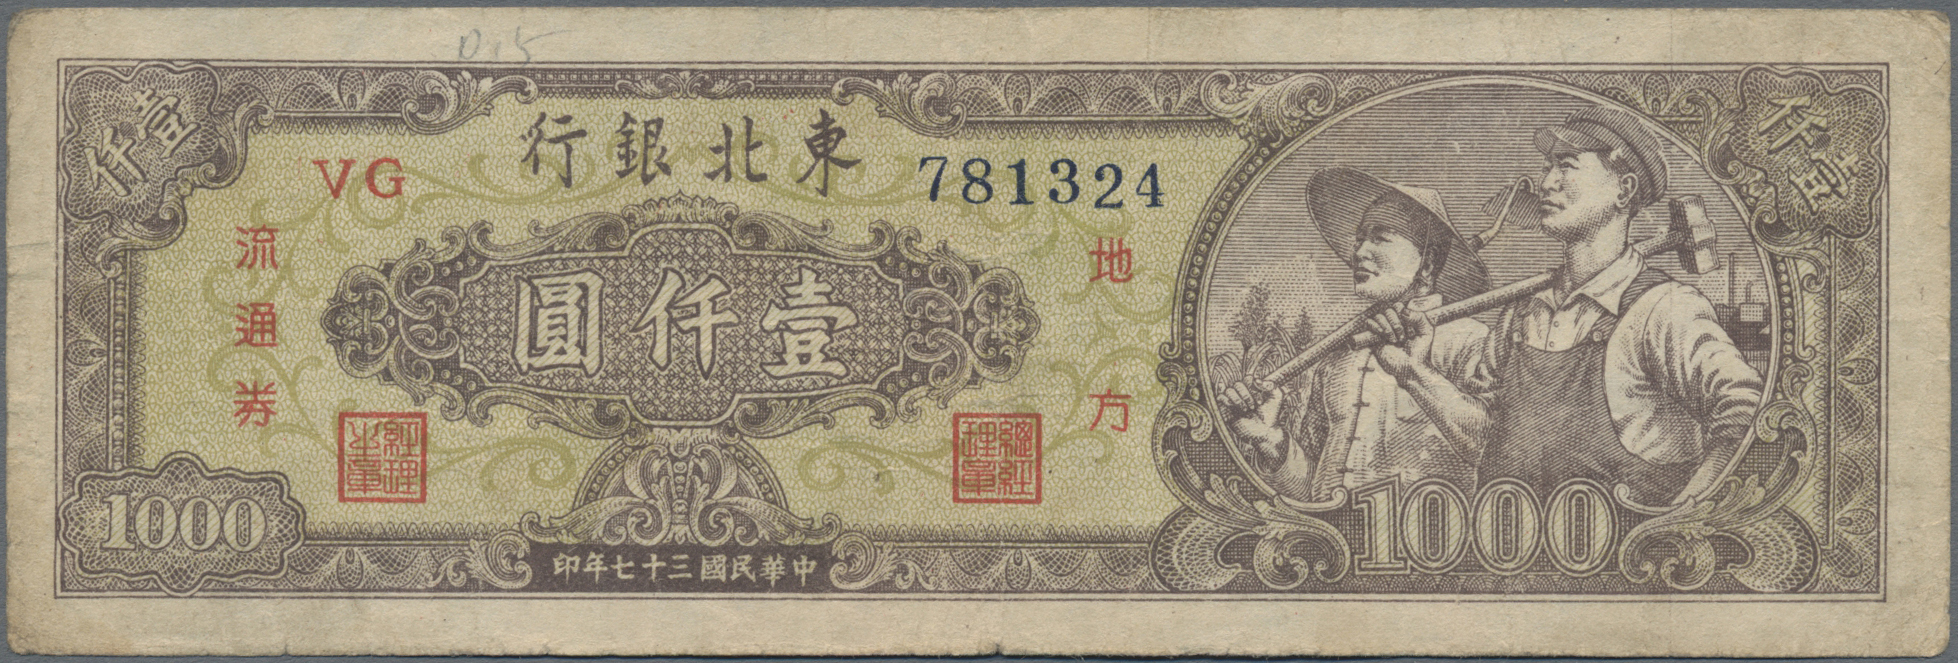 Lot 00137 - China | Banknoten  -  Auktionshaus Christoph Gärtner GmbH & Co. KG Sale #48 The Banknotes